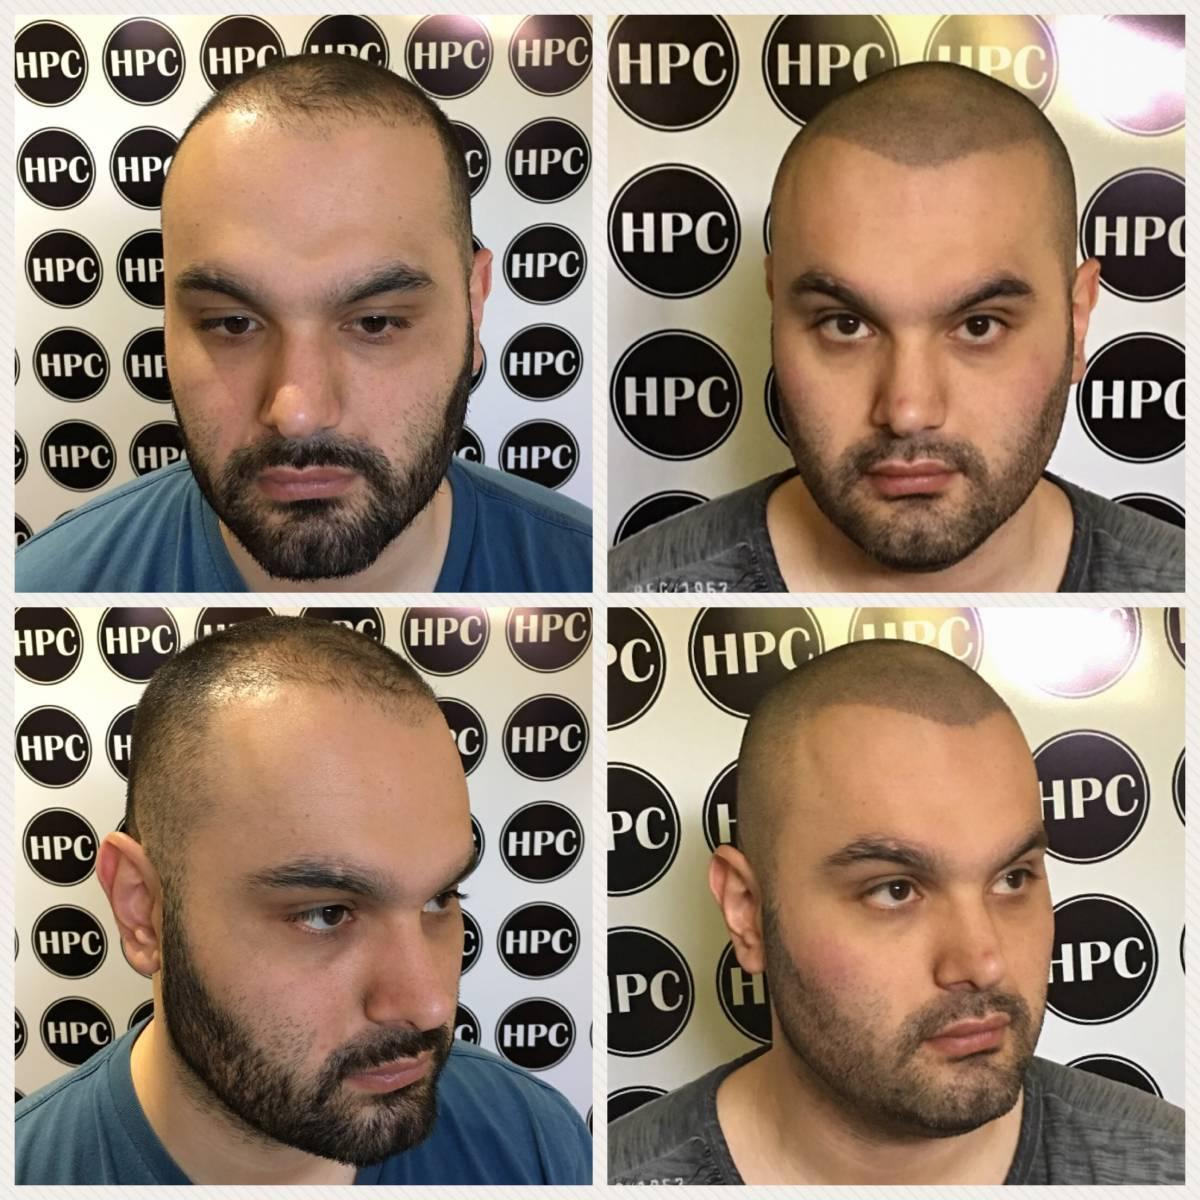 scalp-micropigmentation-11-12-15